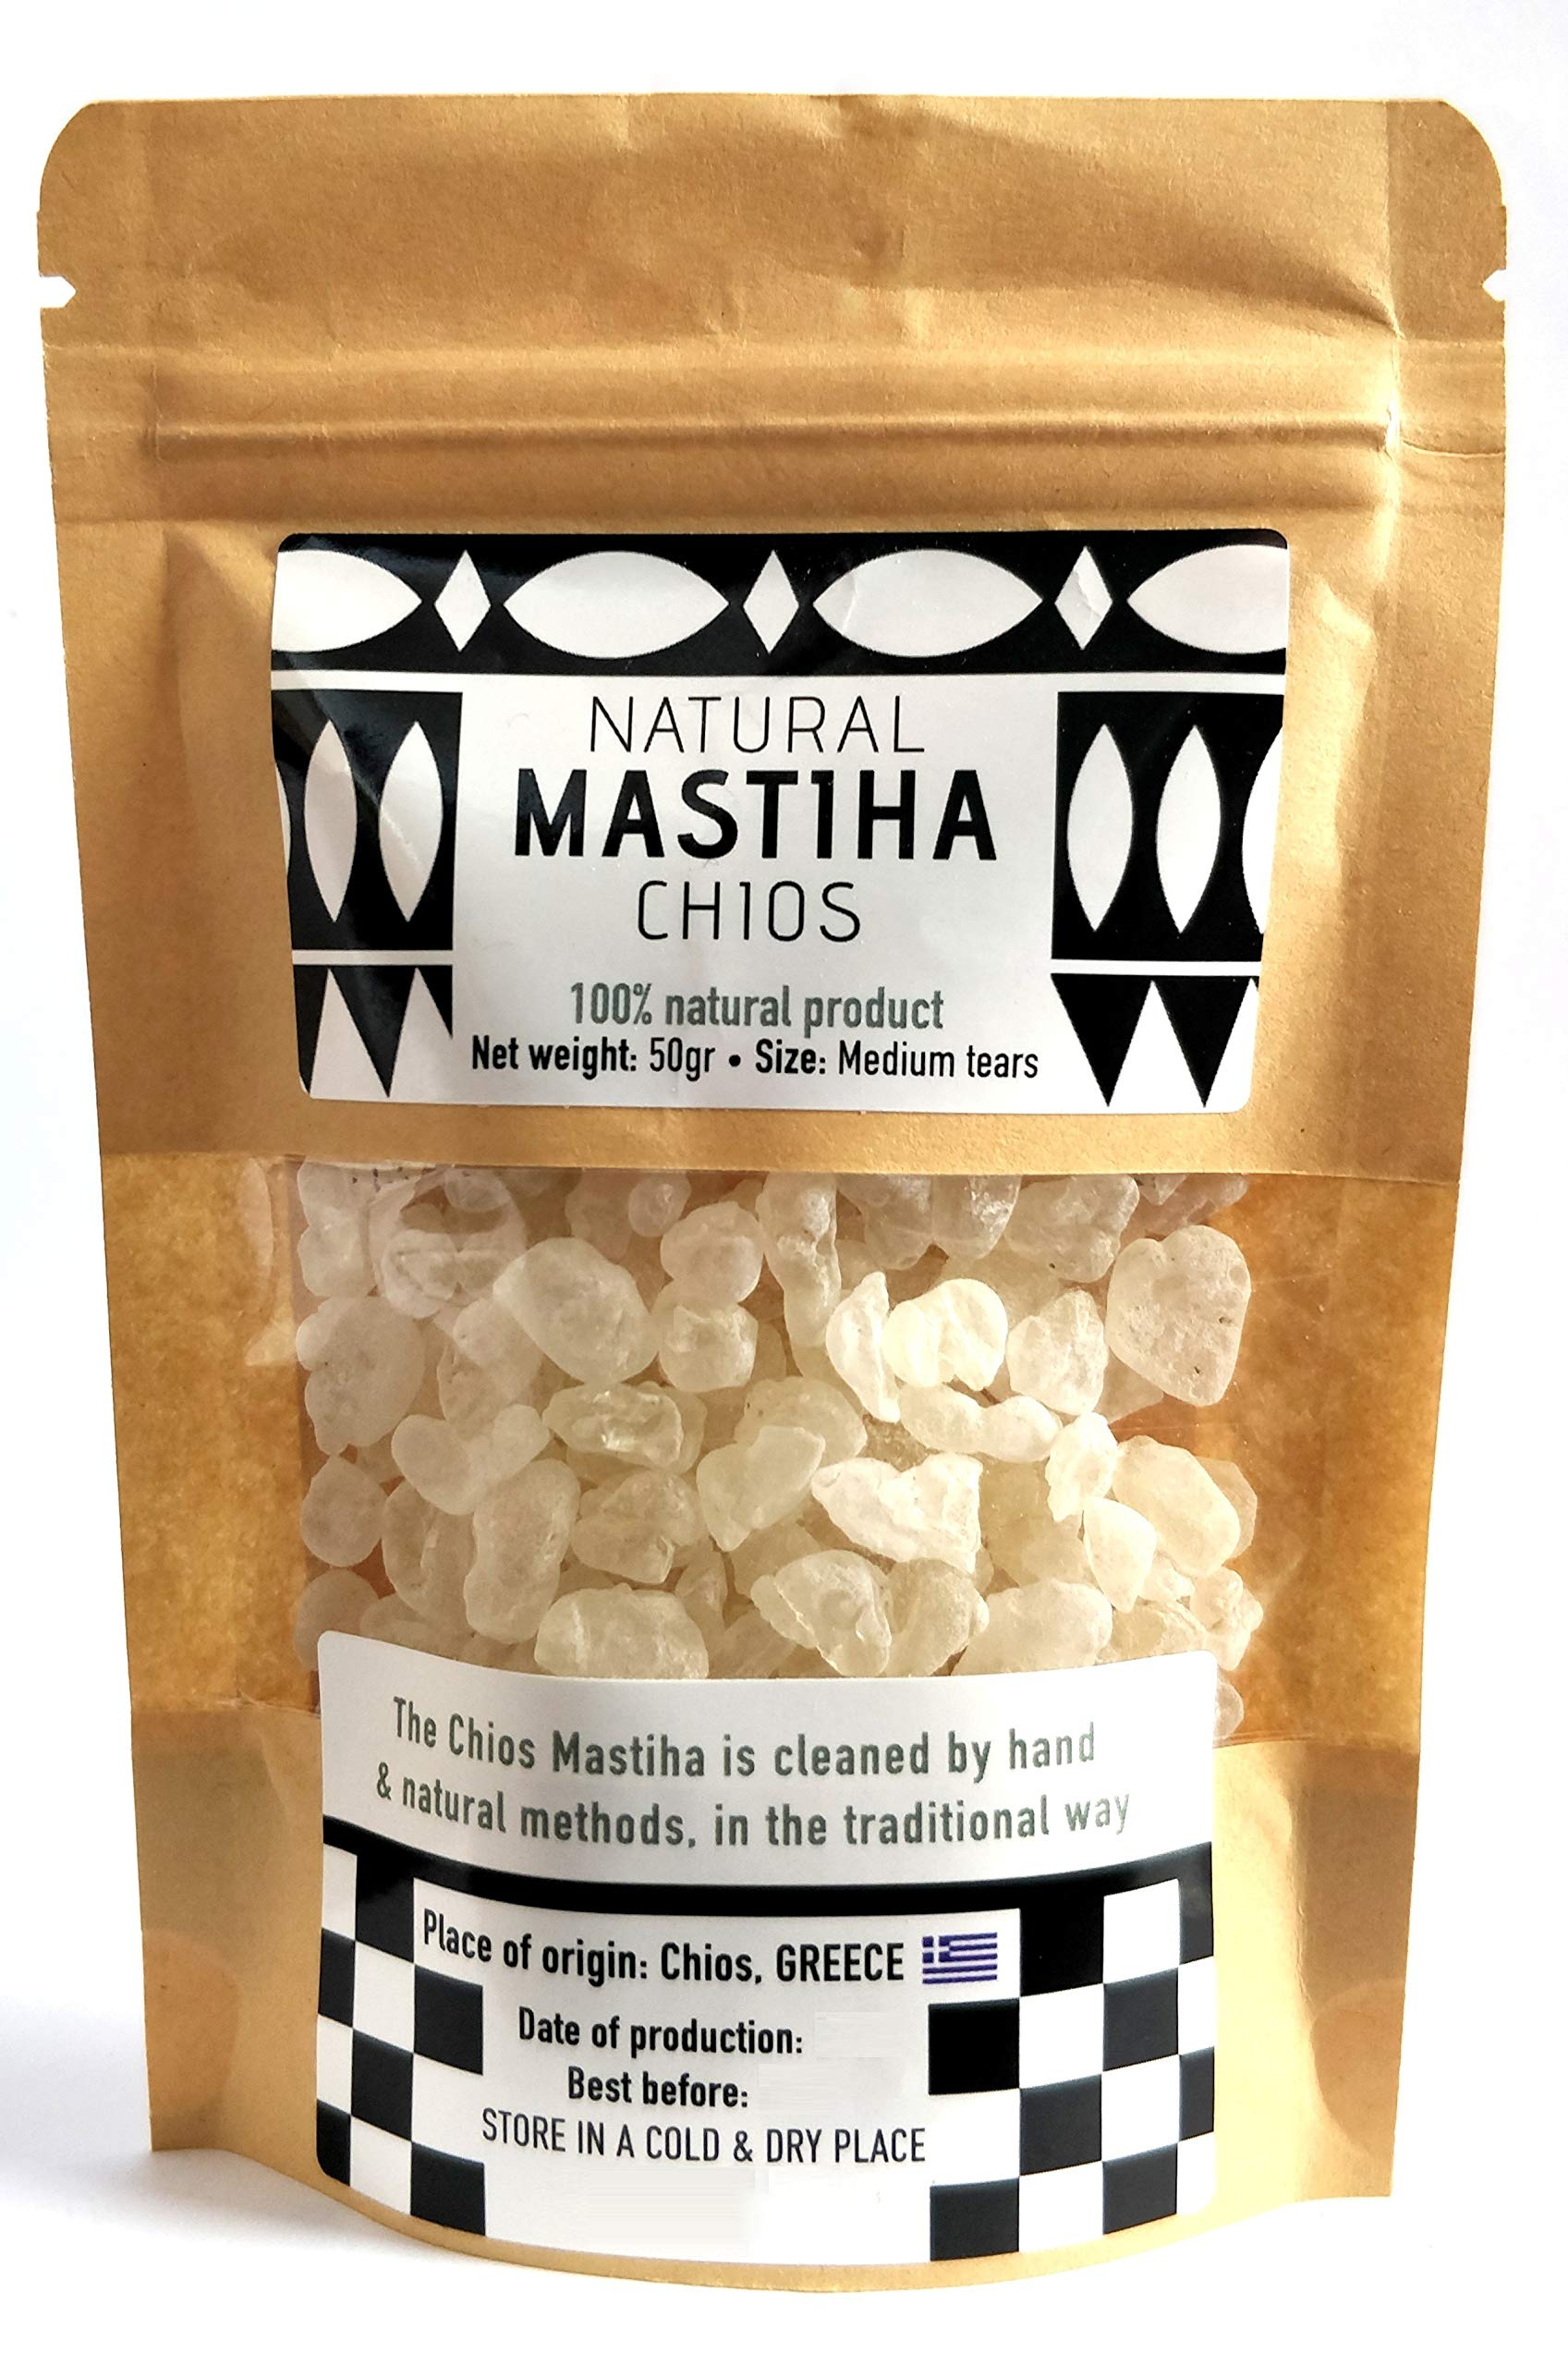 Chios Mastiha Tears Gum Greek 100% Natural Mastic Packs From Mastic Growers (50gr Medium Tears)